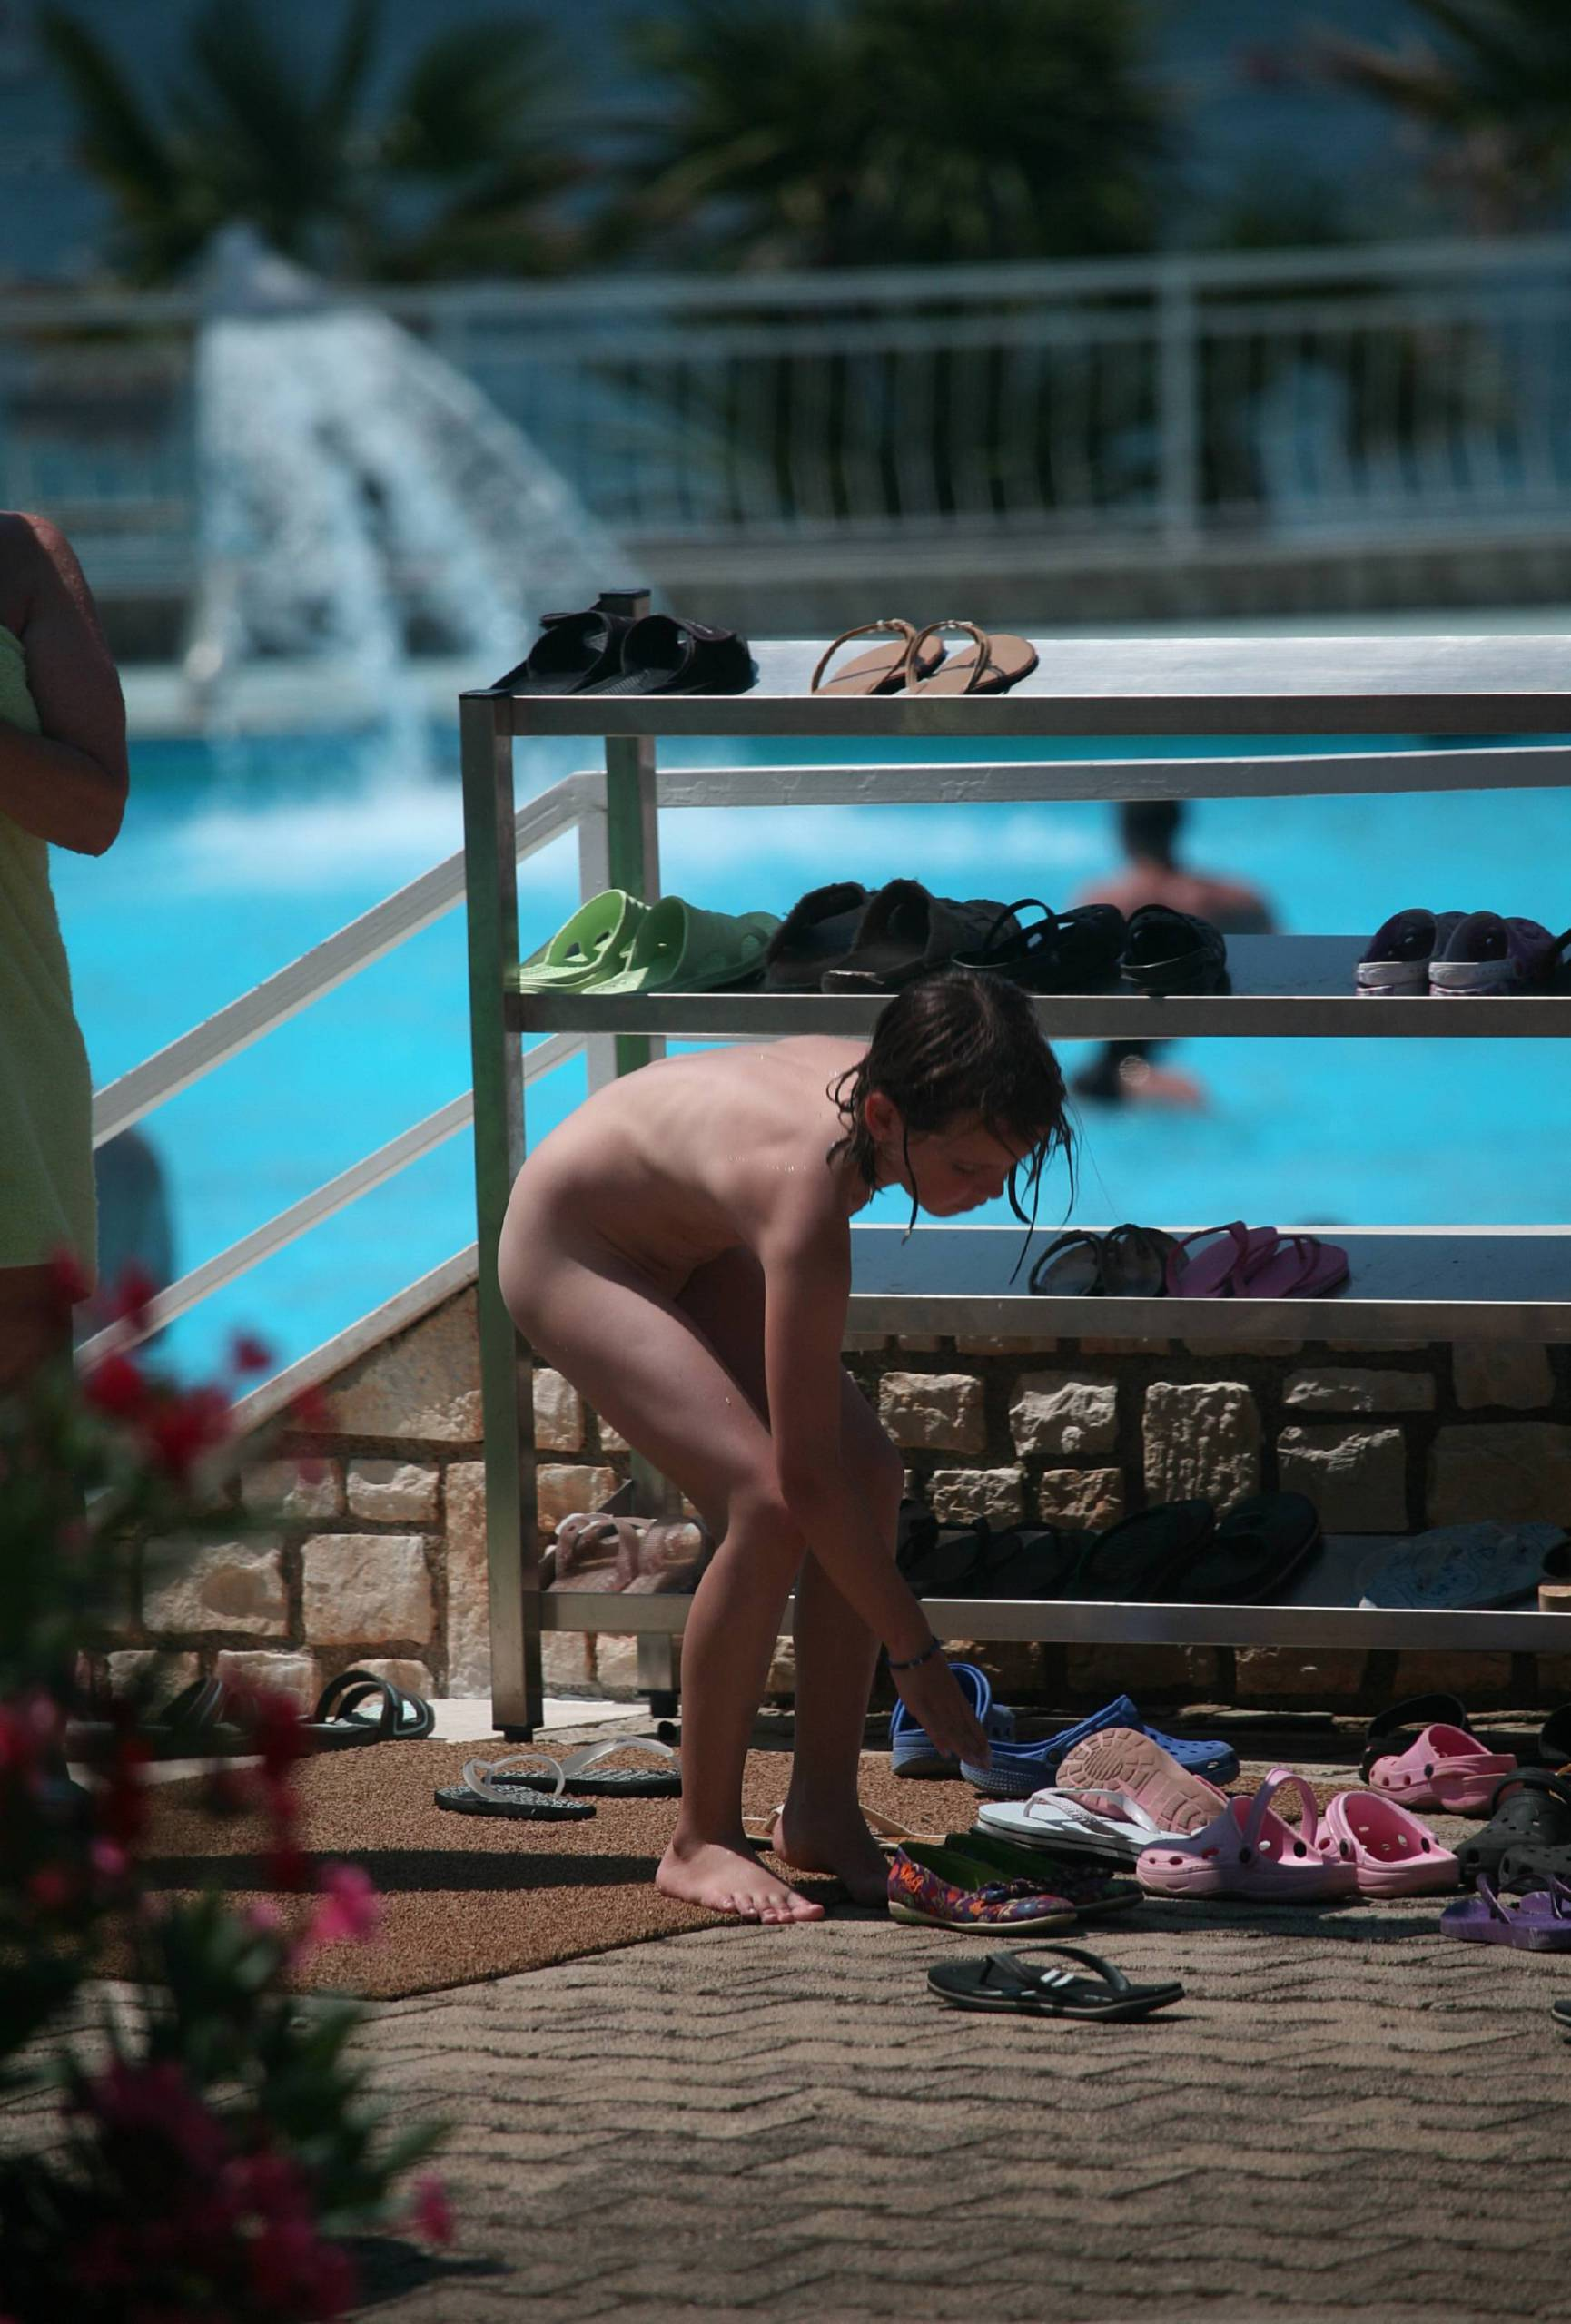 Nudist Photos Nudist Park Child Passing - 2